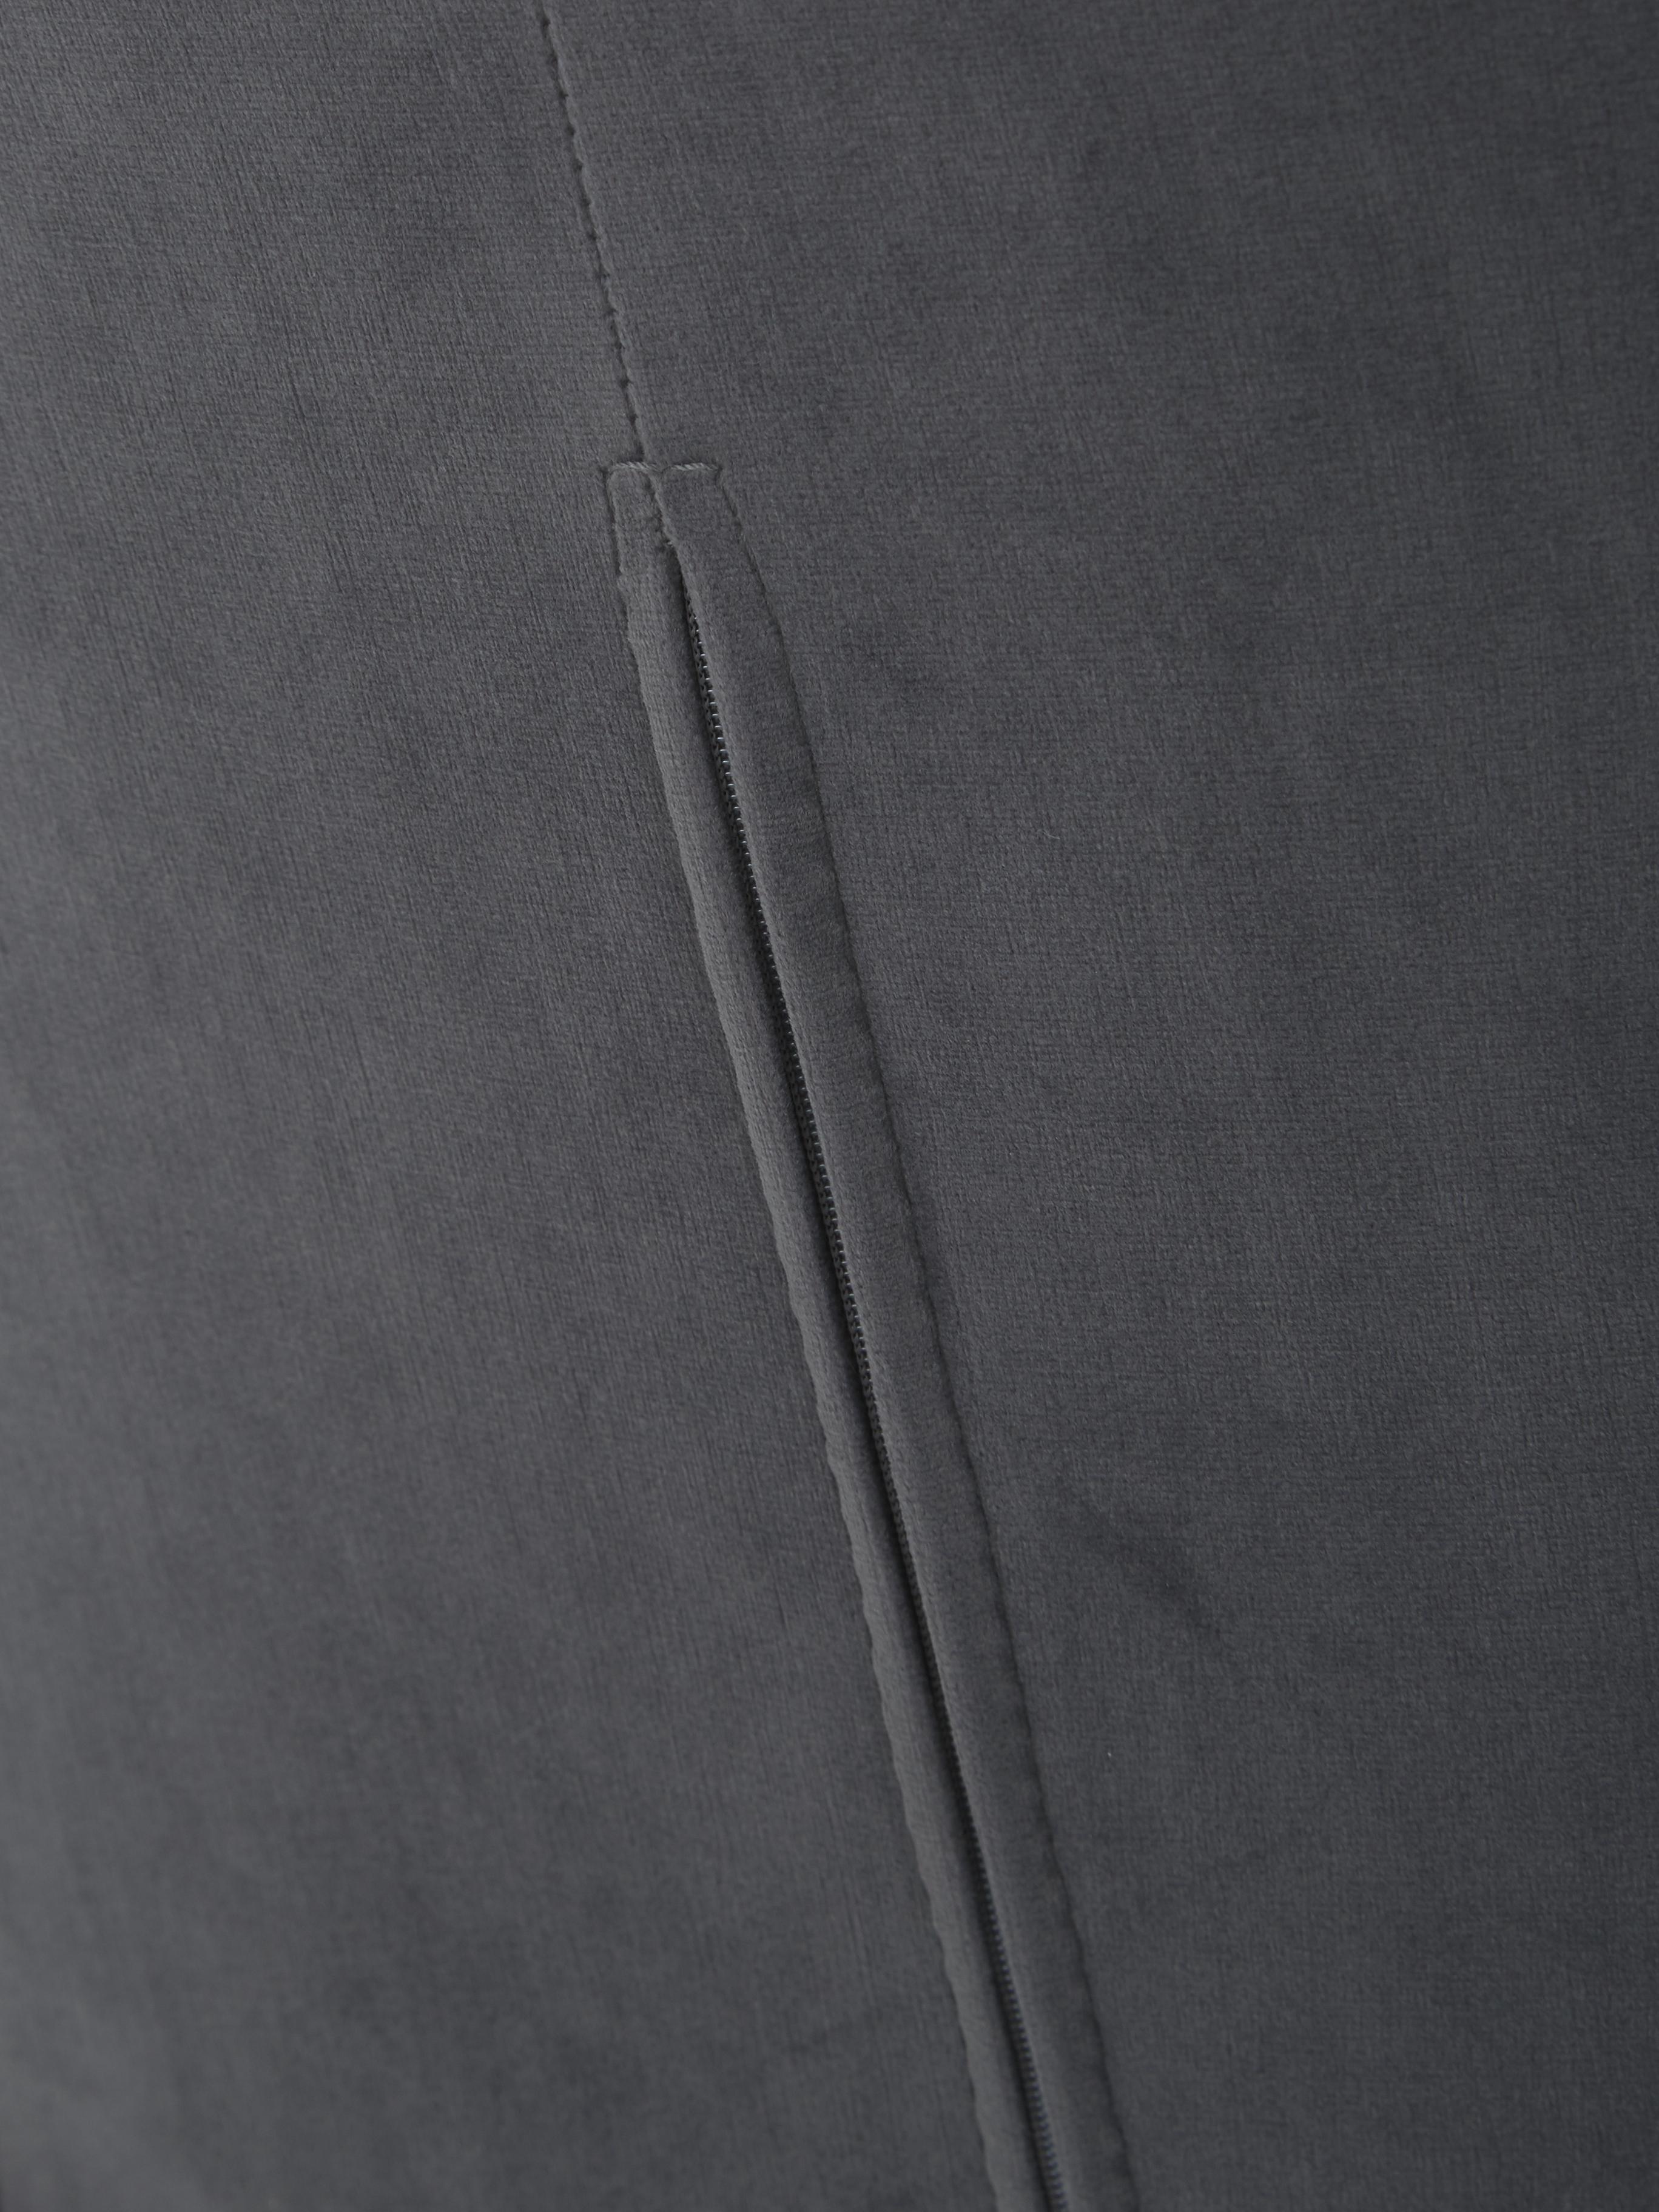 Silla de terciopelo Tess, Tapizado: terciopelo (poliéster) Al, Patas: metal recubierto, Terciopelo gris antracita, An 48 x Al 84 cm